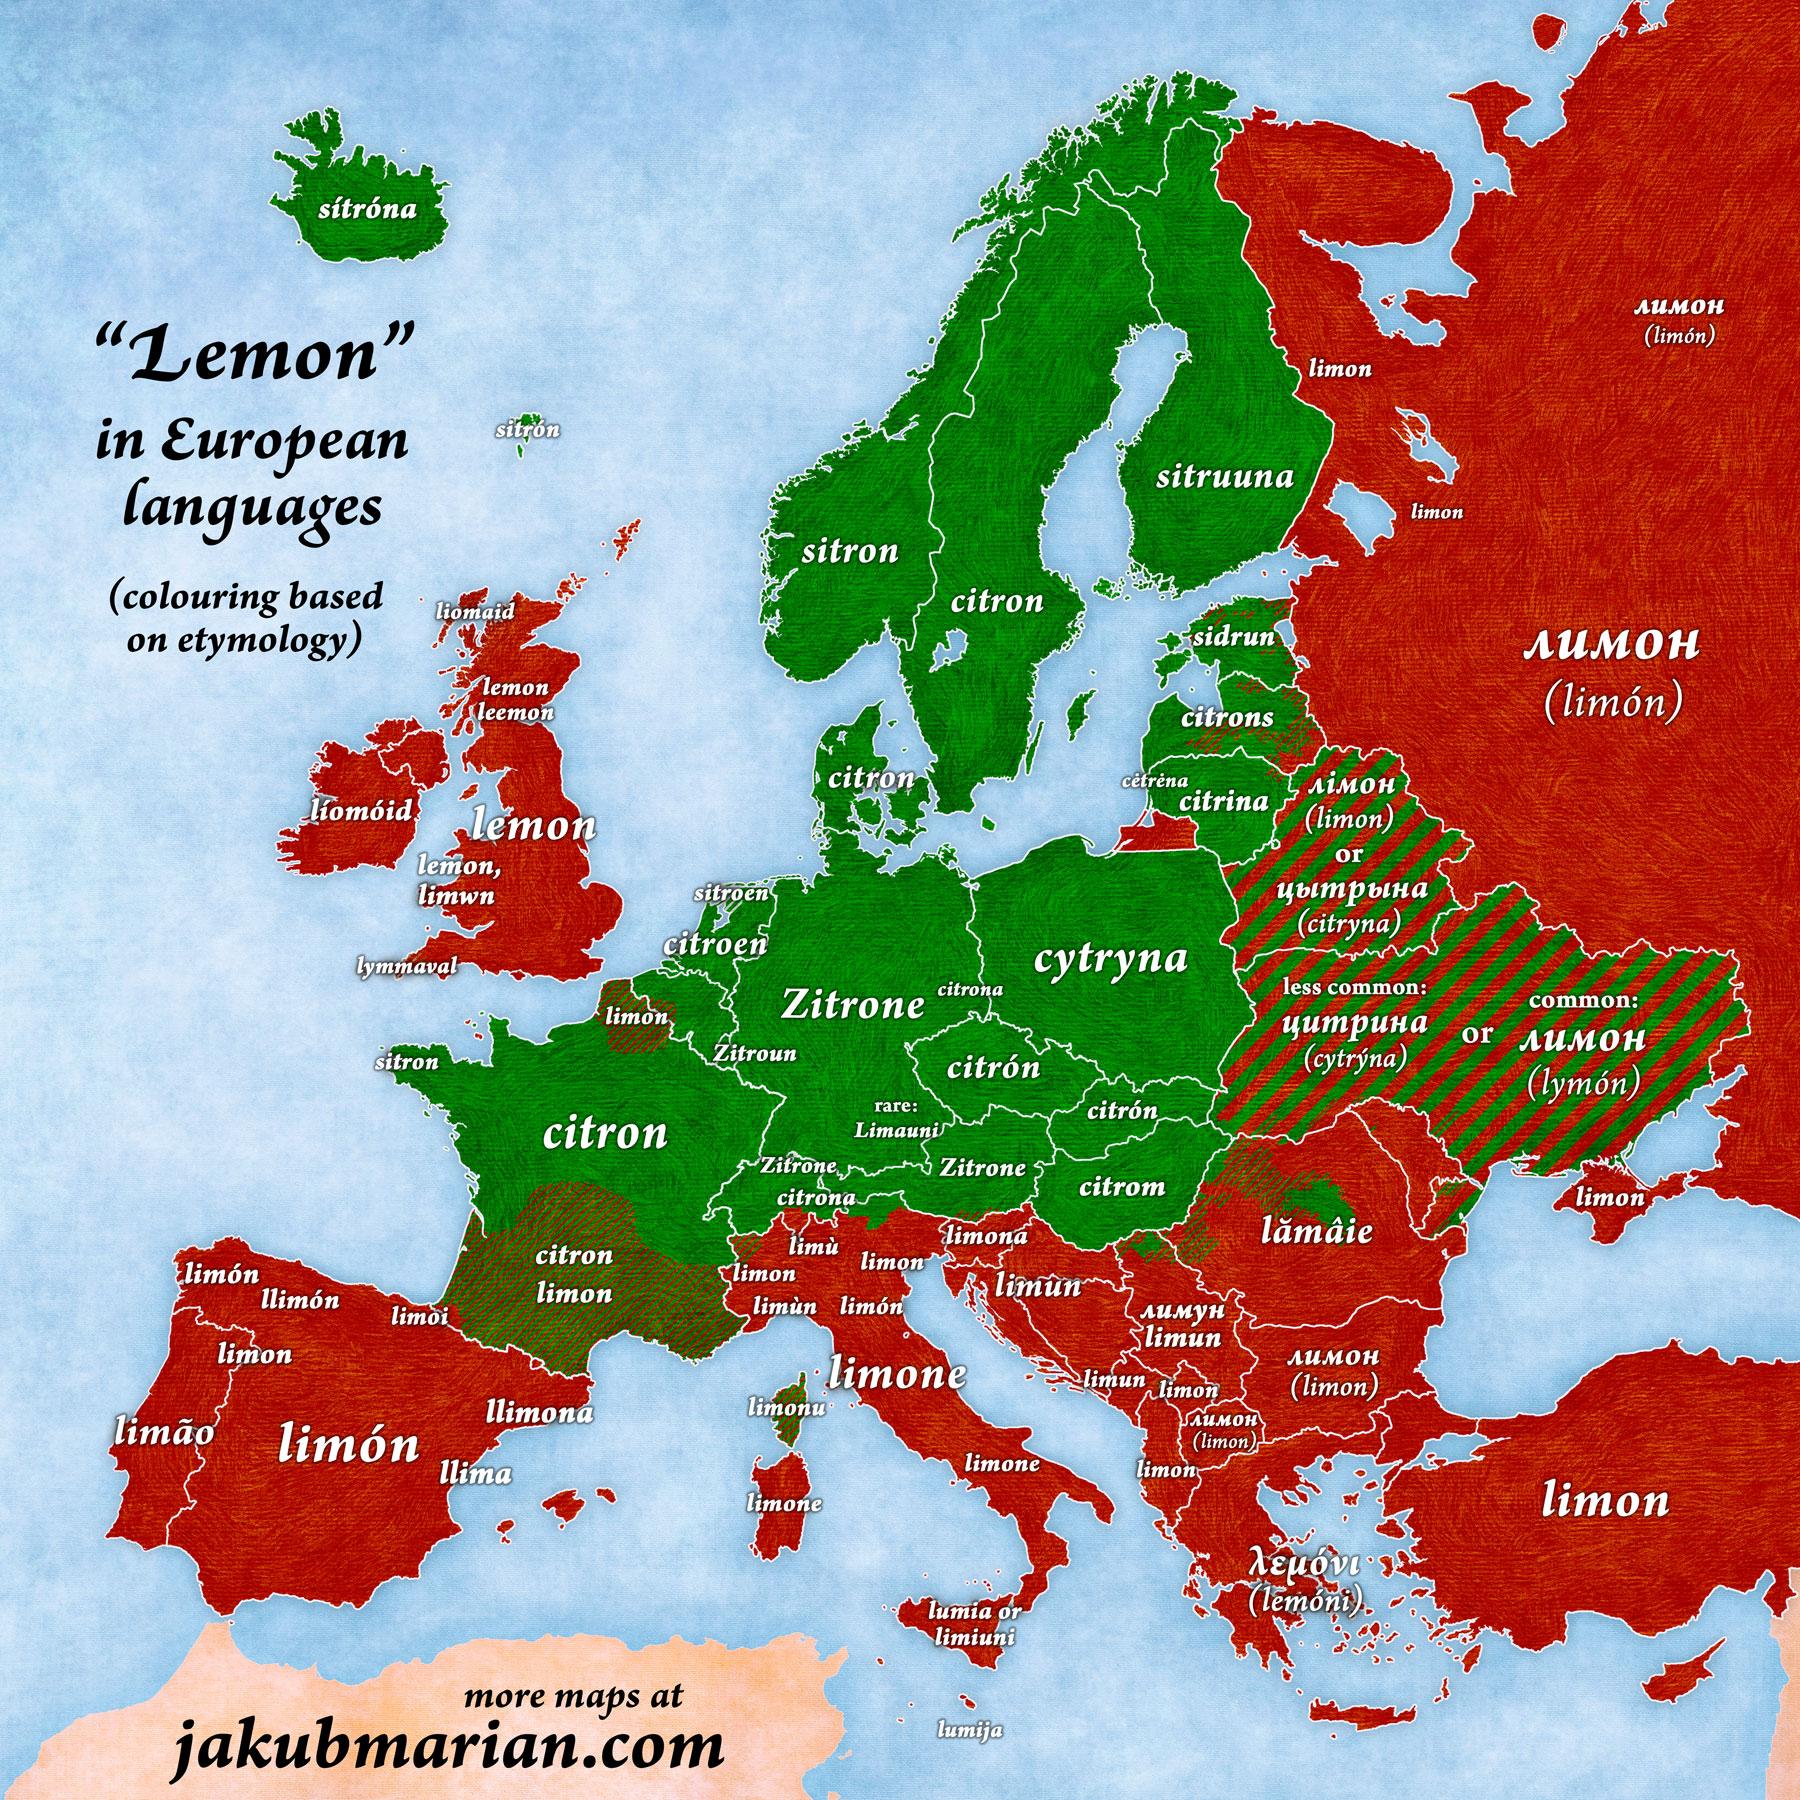 lemon in European languages